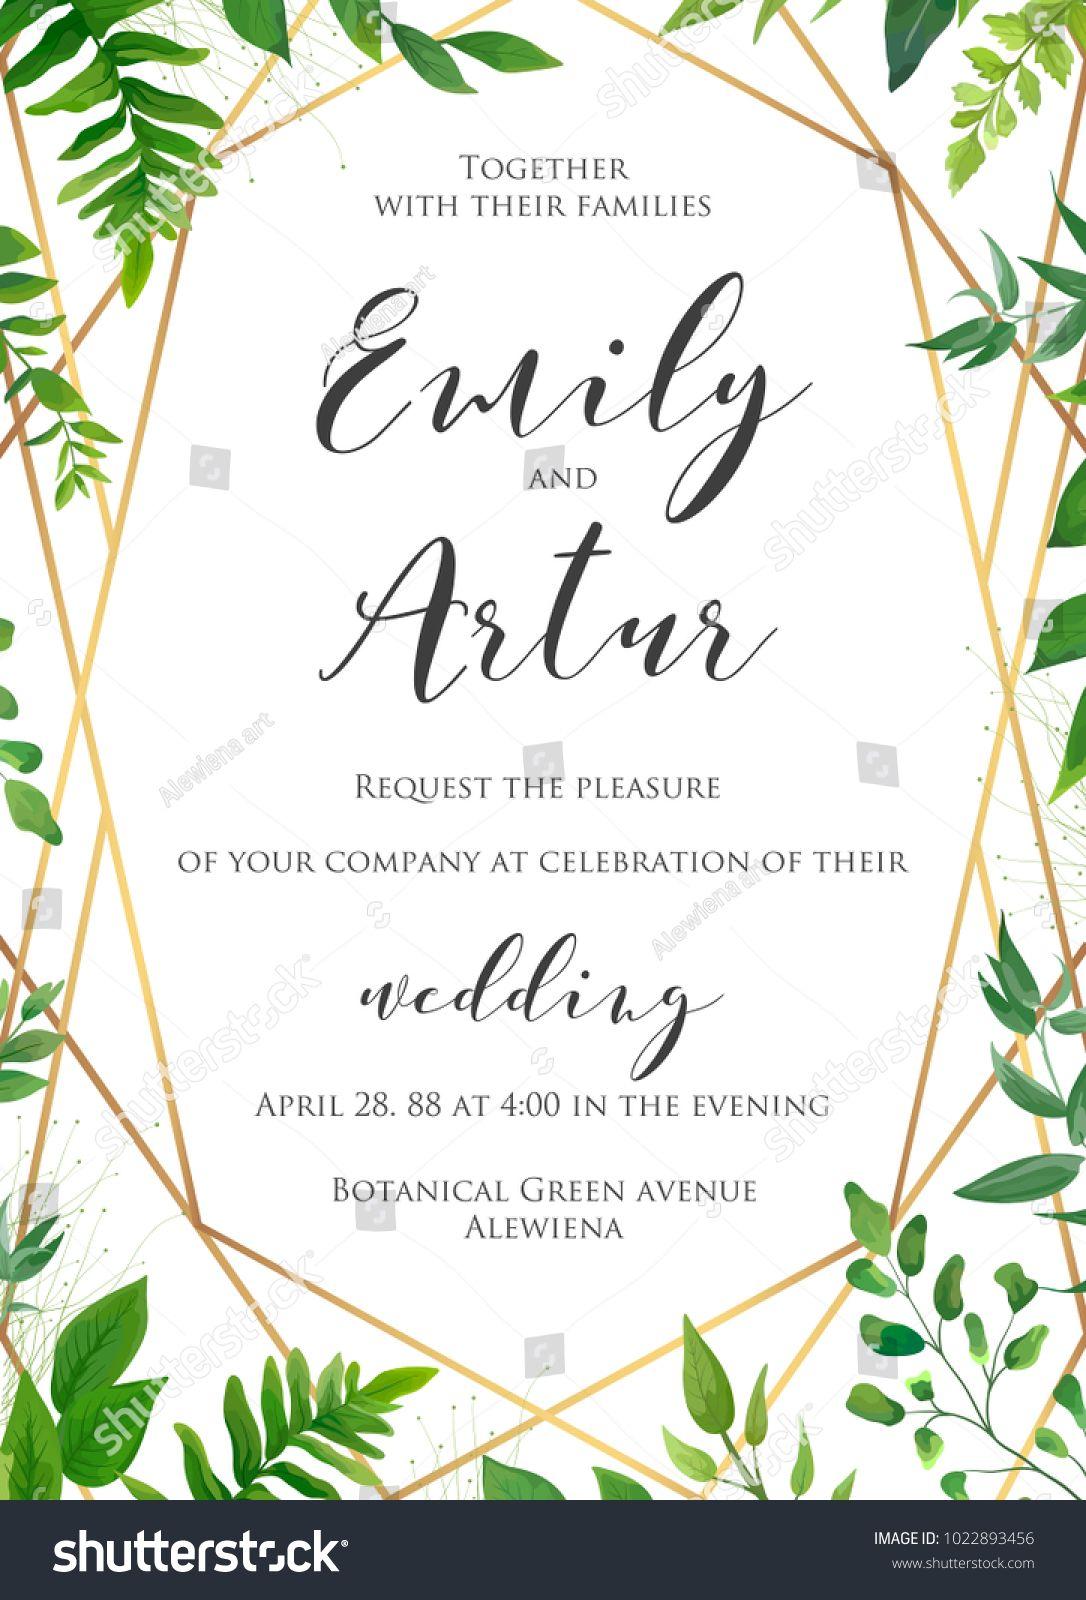 Natural botanical wedding invitation invite save the date template natural botanical wedding invitation invite save the date template vector floral design card stopboris Gallery